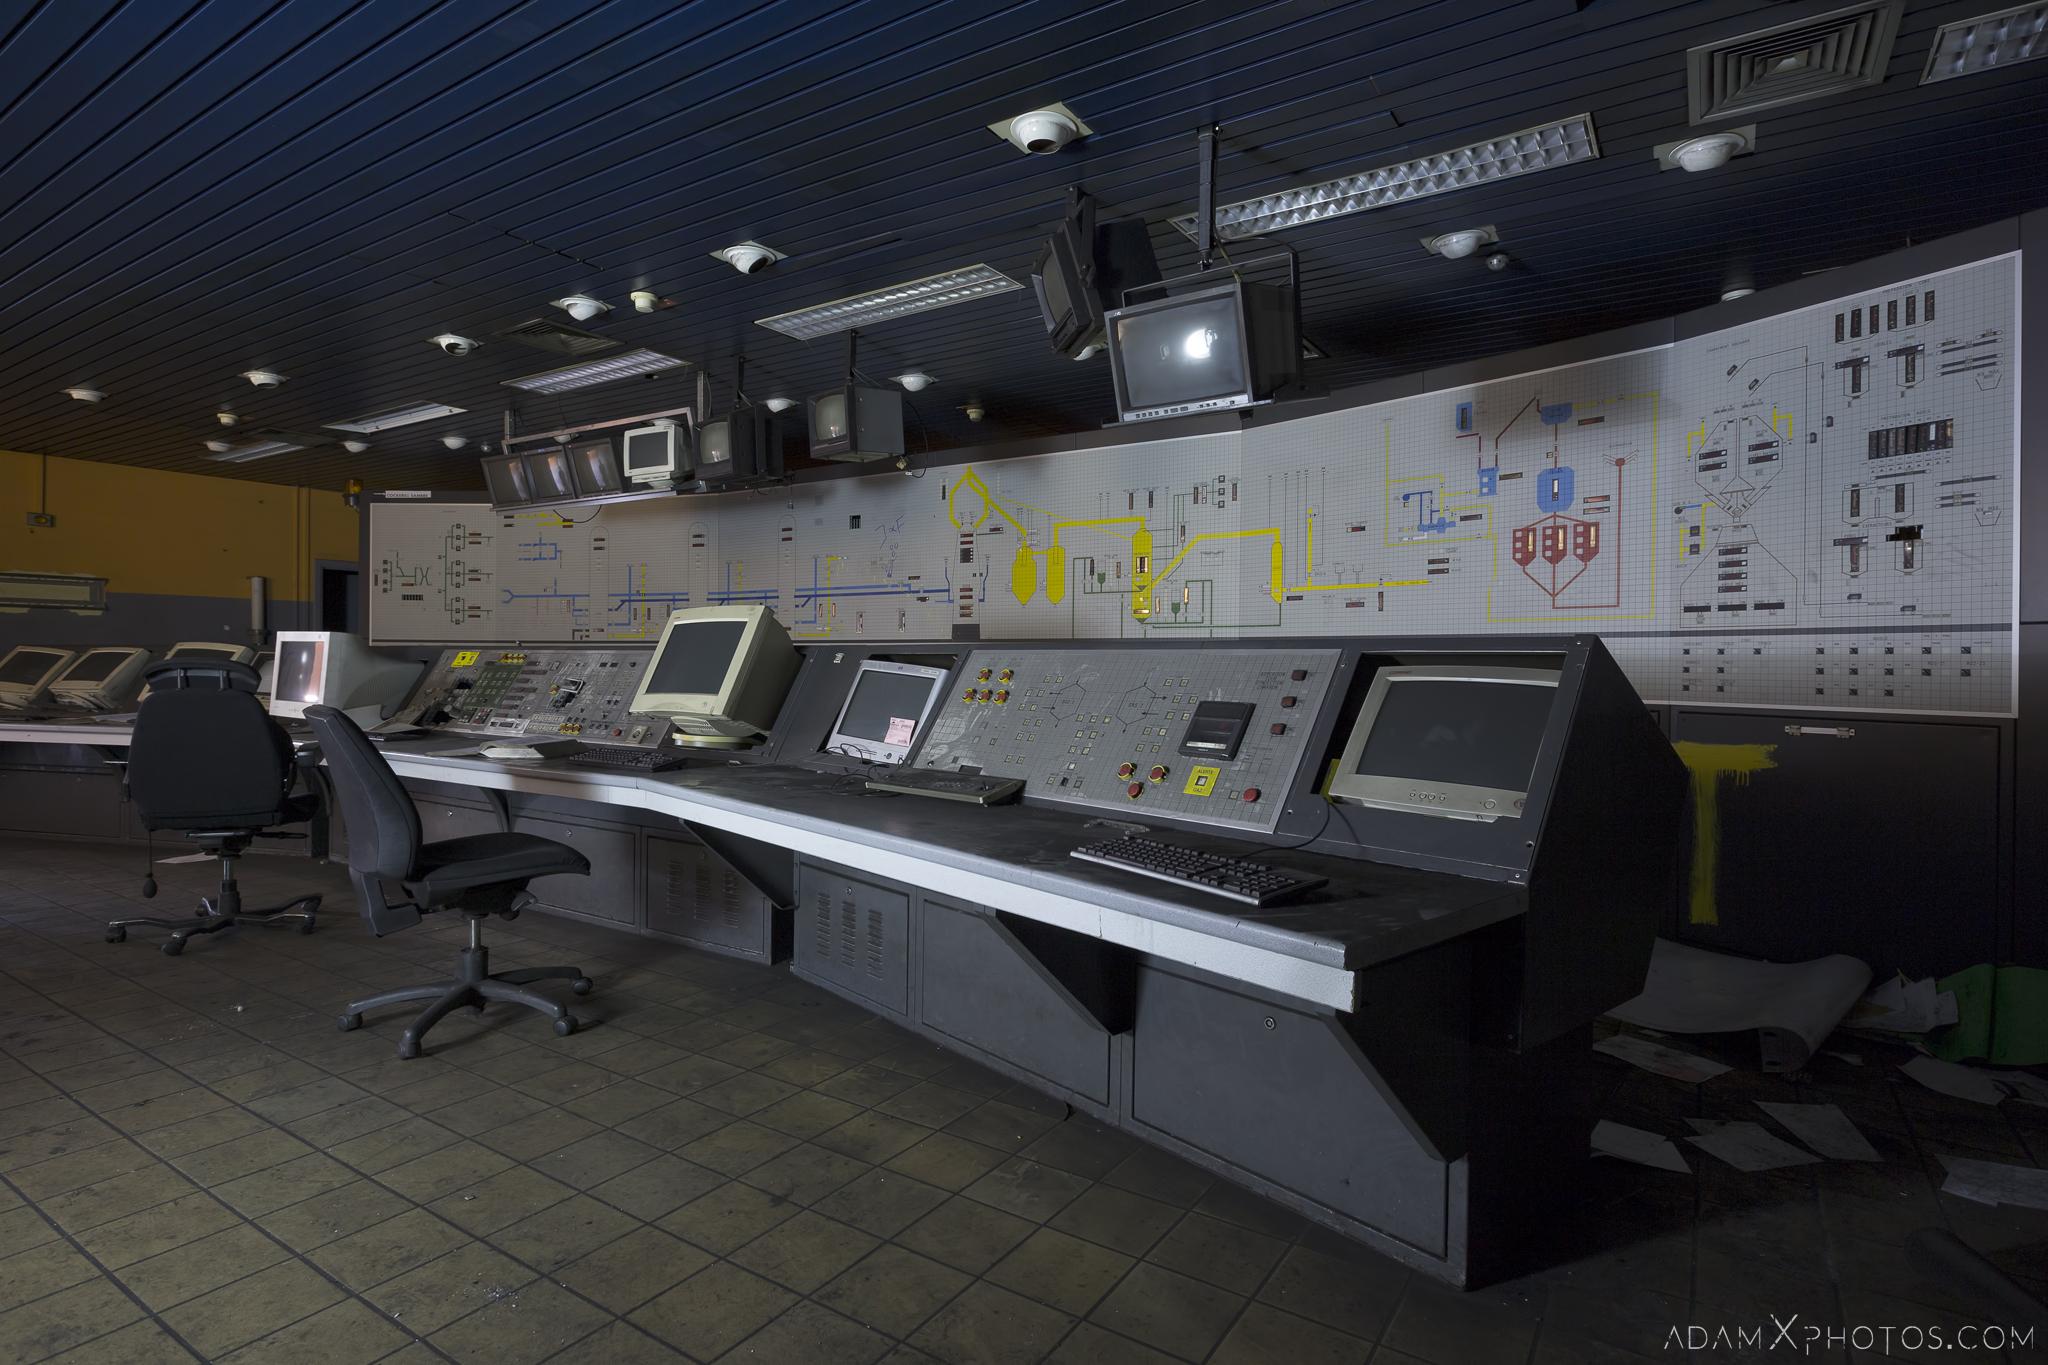 Control Room desk panels retro Haut Fourneau B HFB Blast Furnace Steelworks Adam X Urban Exploration Belgium Access 2017 Abandoned decay lost forgotten derelict location creepy haunting eerie